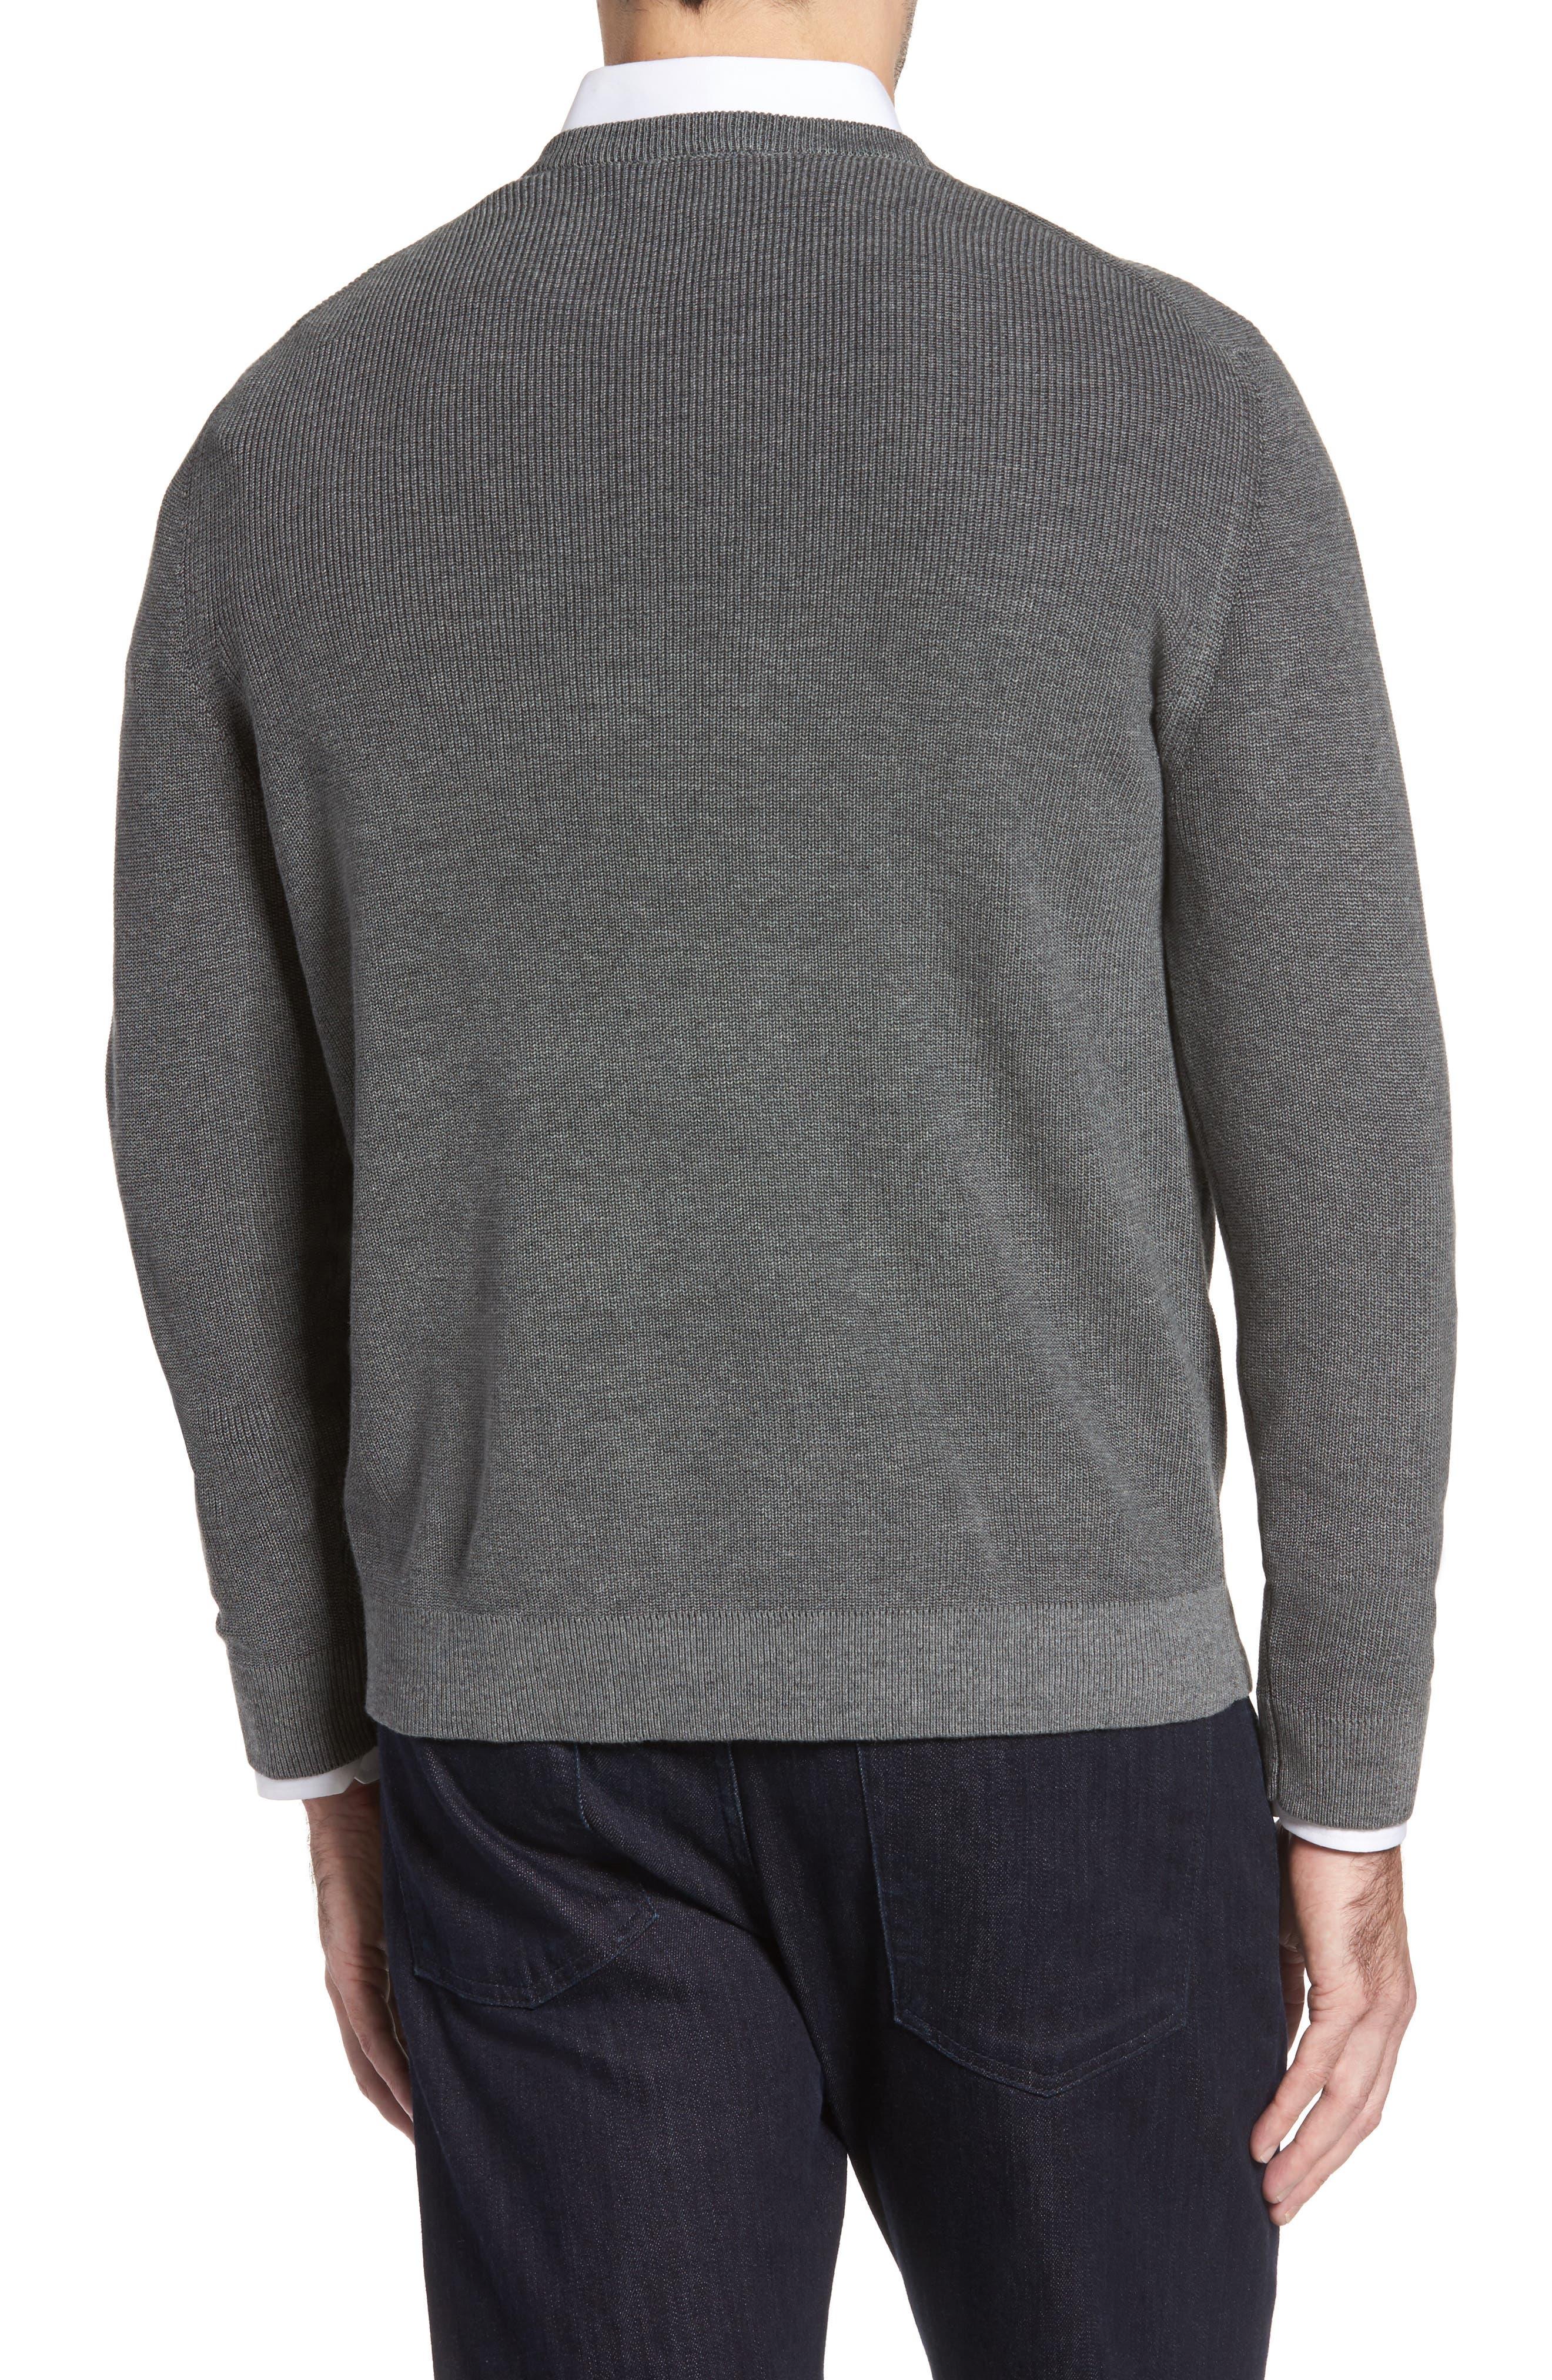 Las Palmas Reversible Sweater,                             Alternate thumbnail 2, color,                             Charcoal Heather